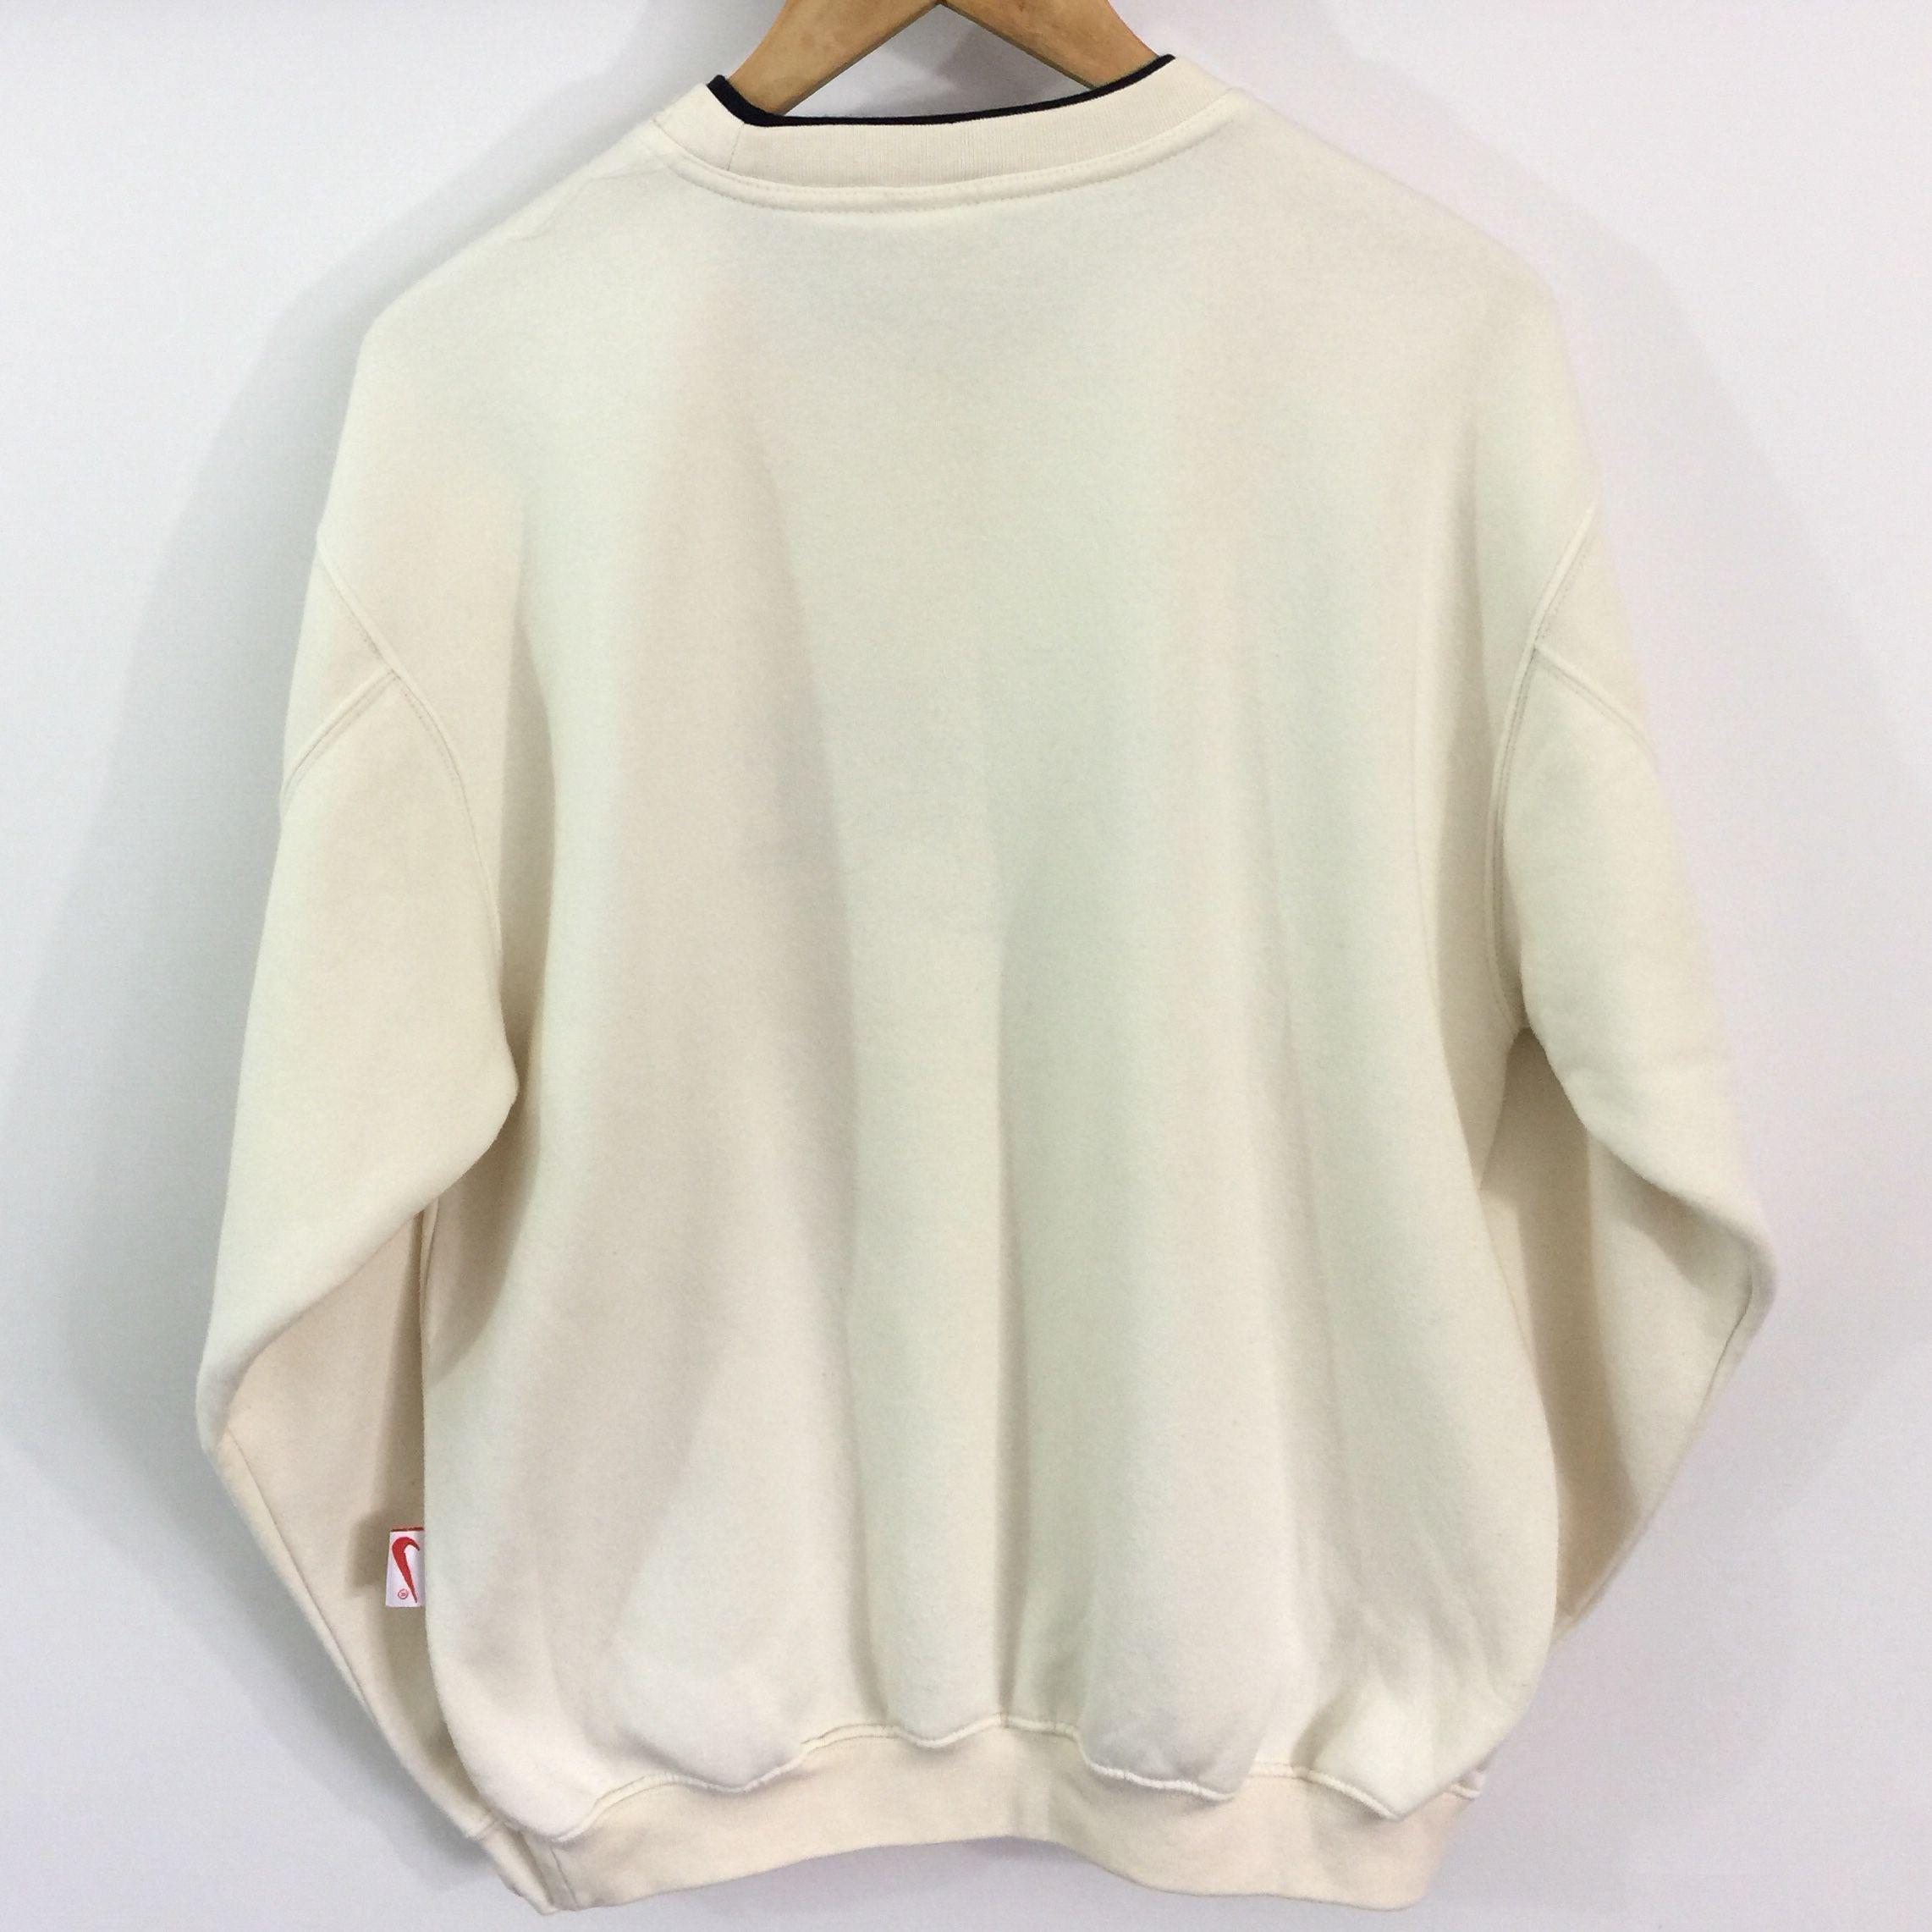 Vintage Nike Sweatshirt Label Size Medium Cream Depop Vintage Nike Sweatshirt Vintage Hoodies Sweatshirts [ 2283 x 2283 Pixel ]